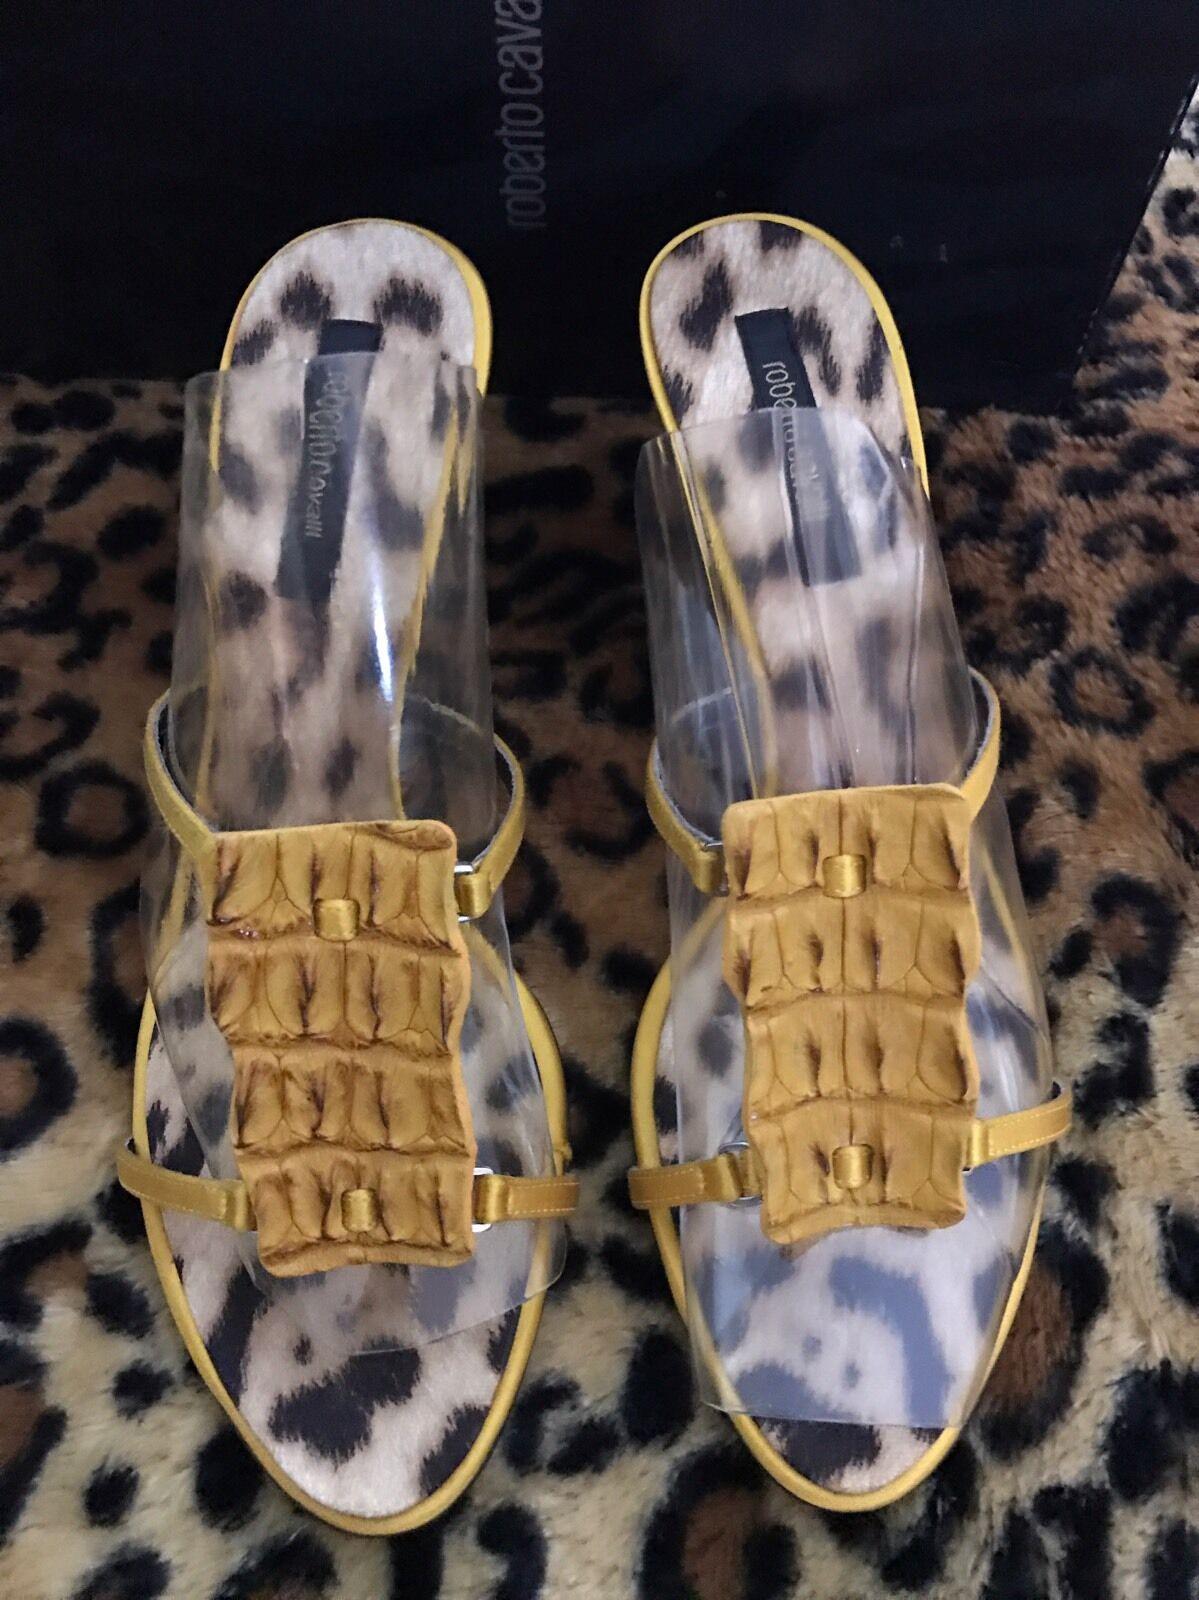 Wt Roberto Cavalli Embass Croc Caramelle Scarpe 39.5 Made in    550  vendite online